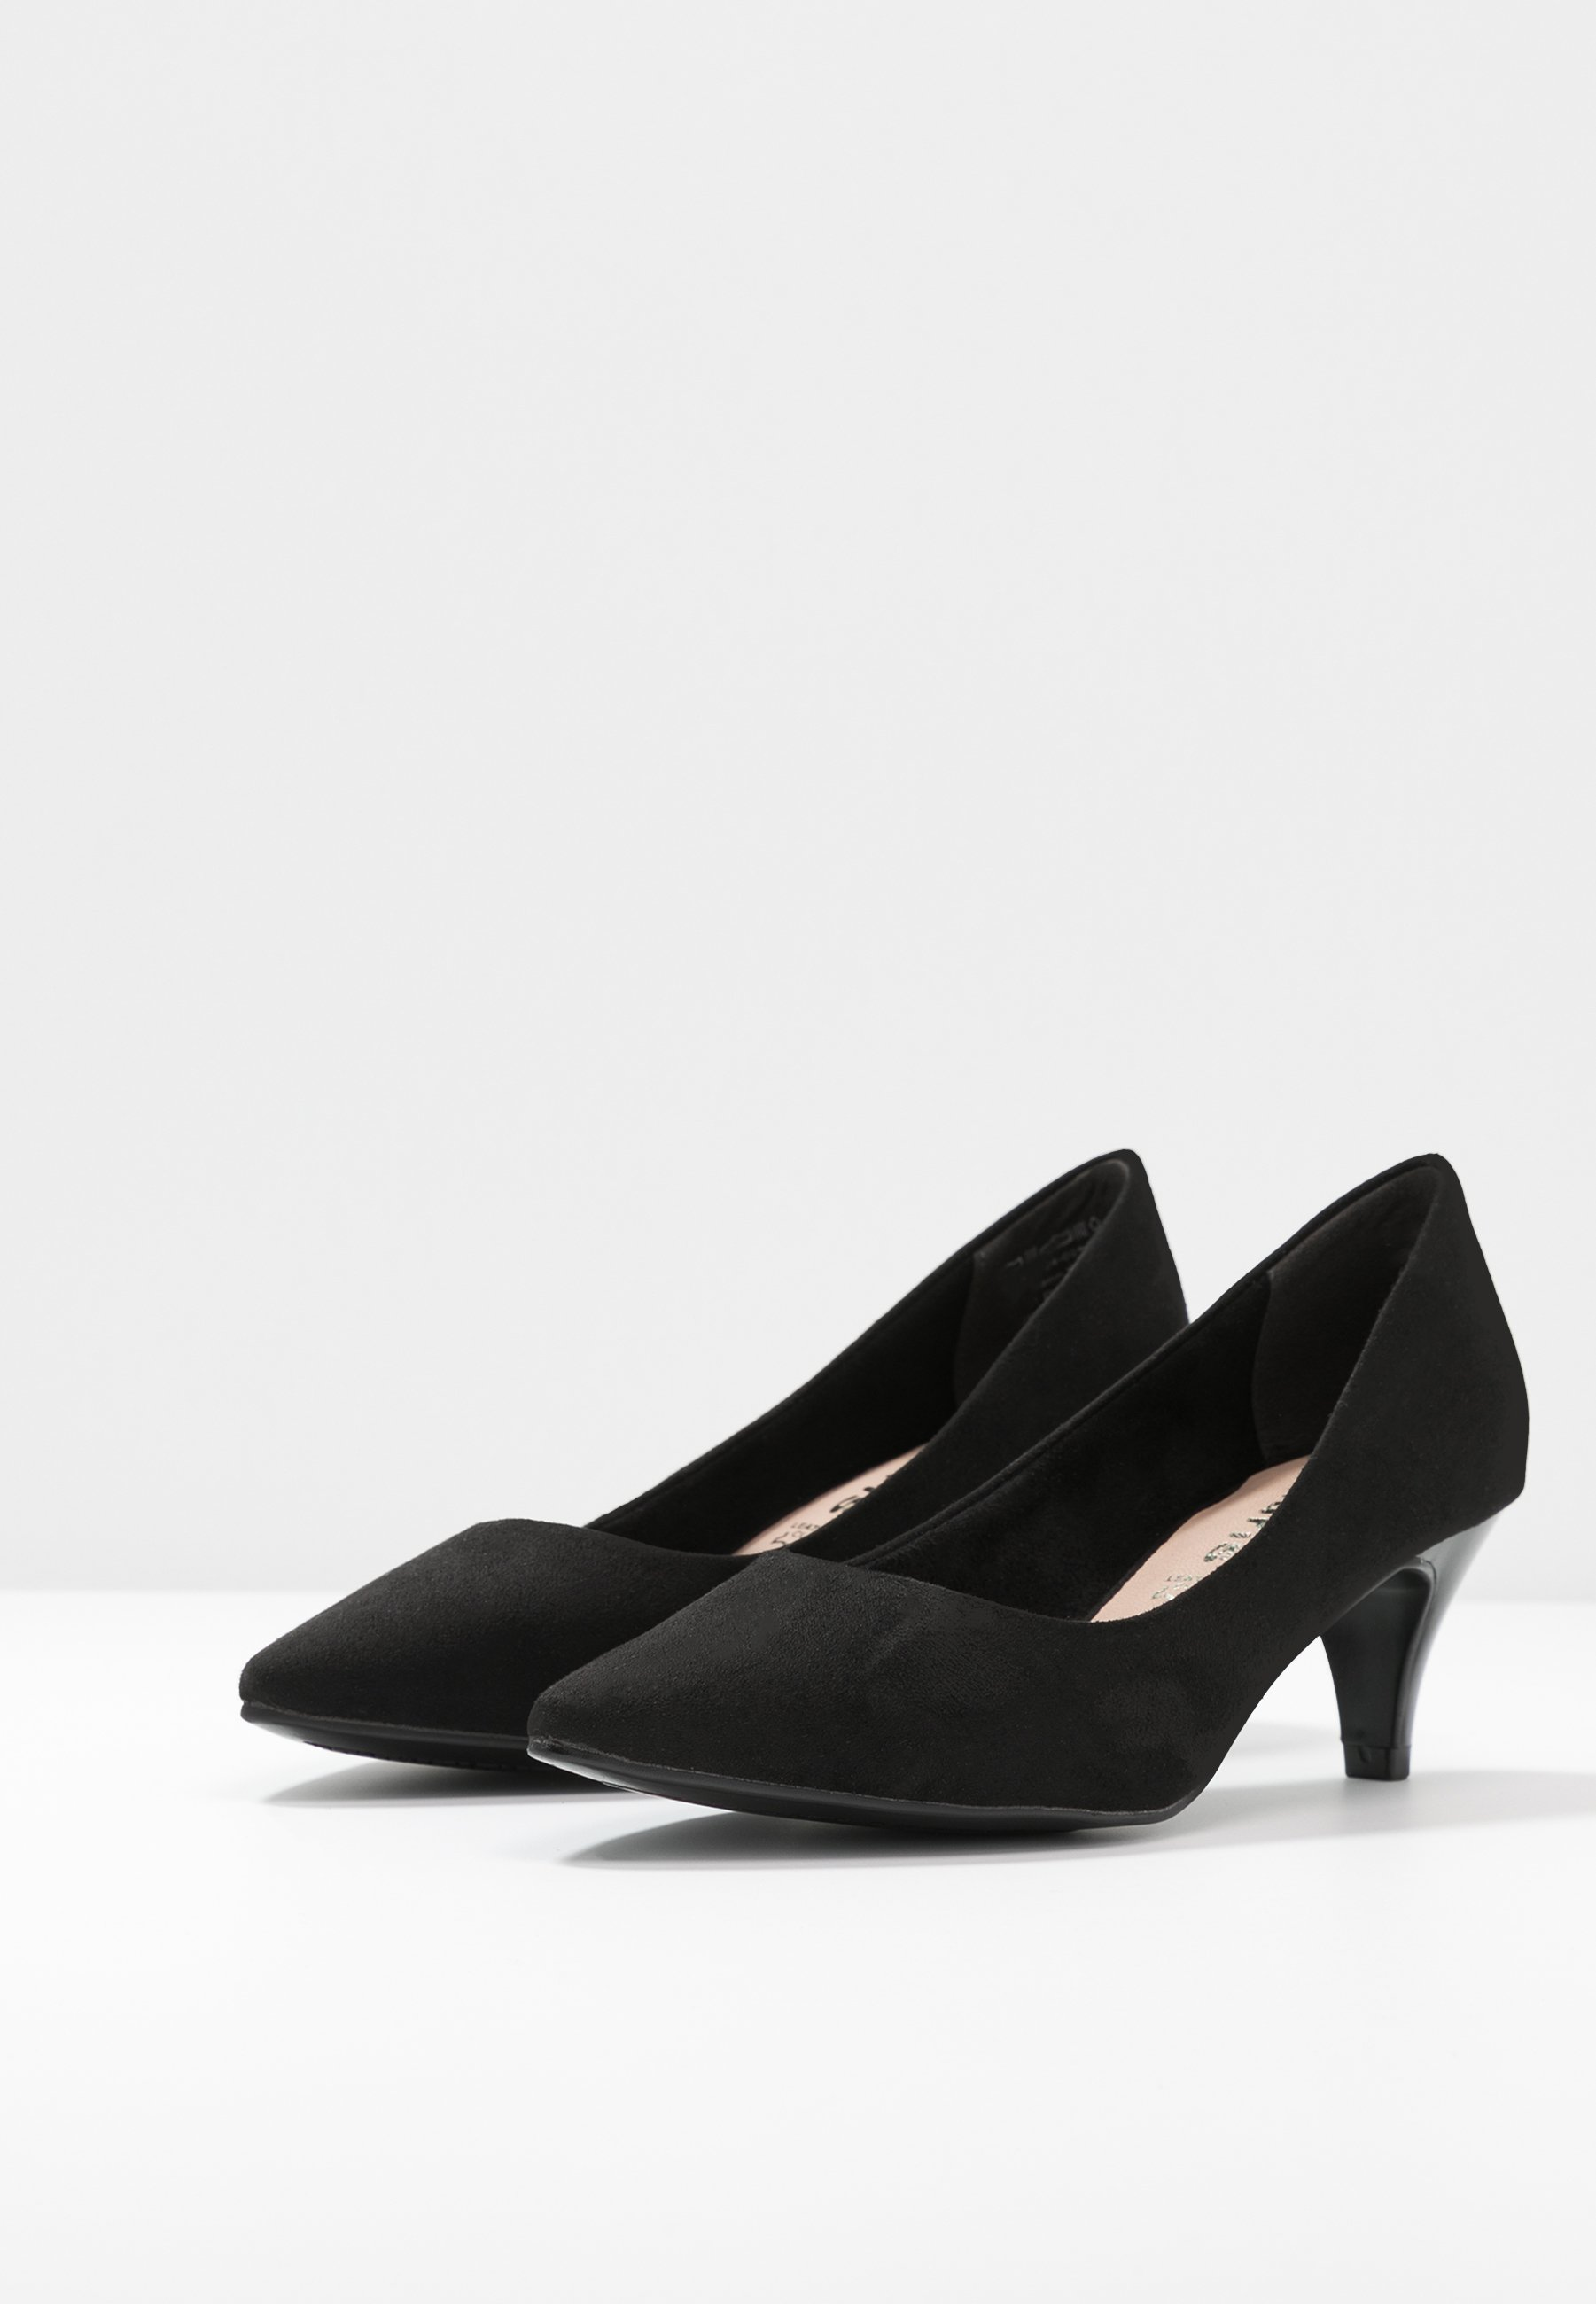 Tamaris Classic heels - black